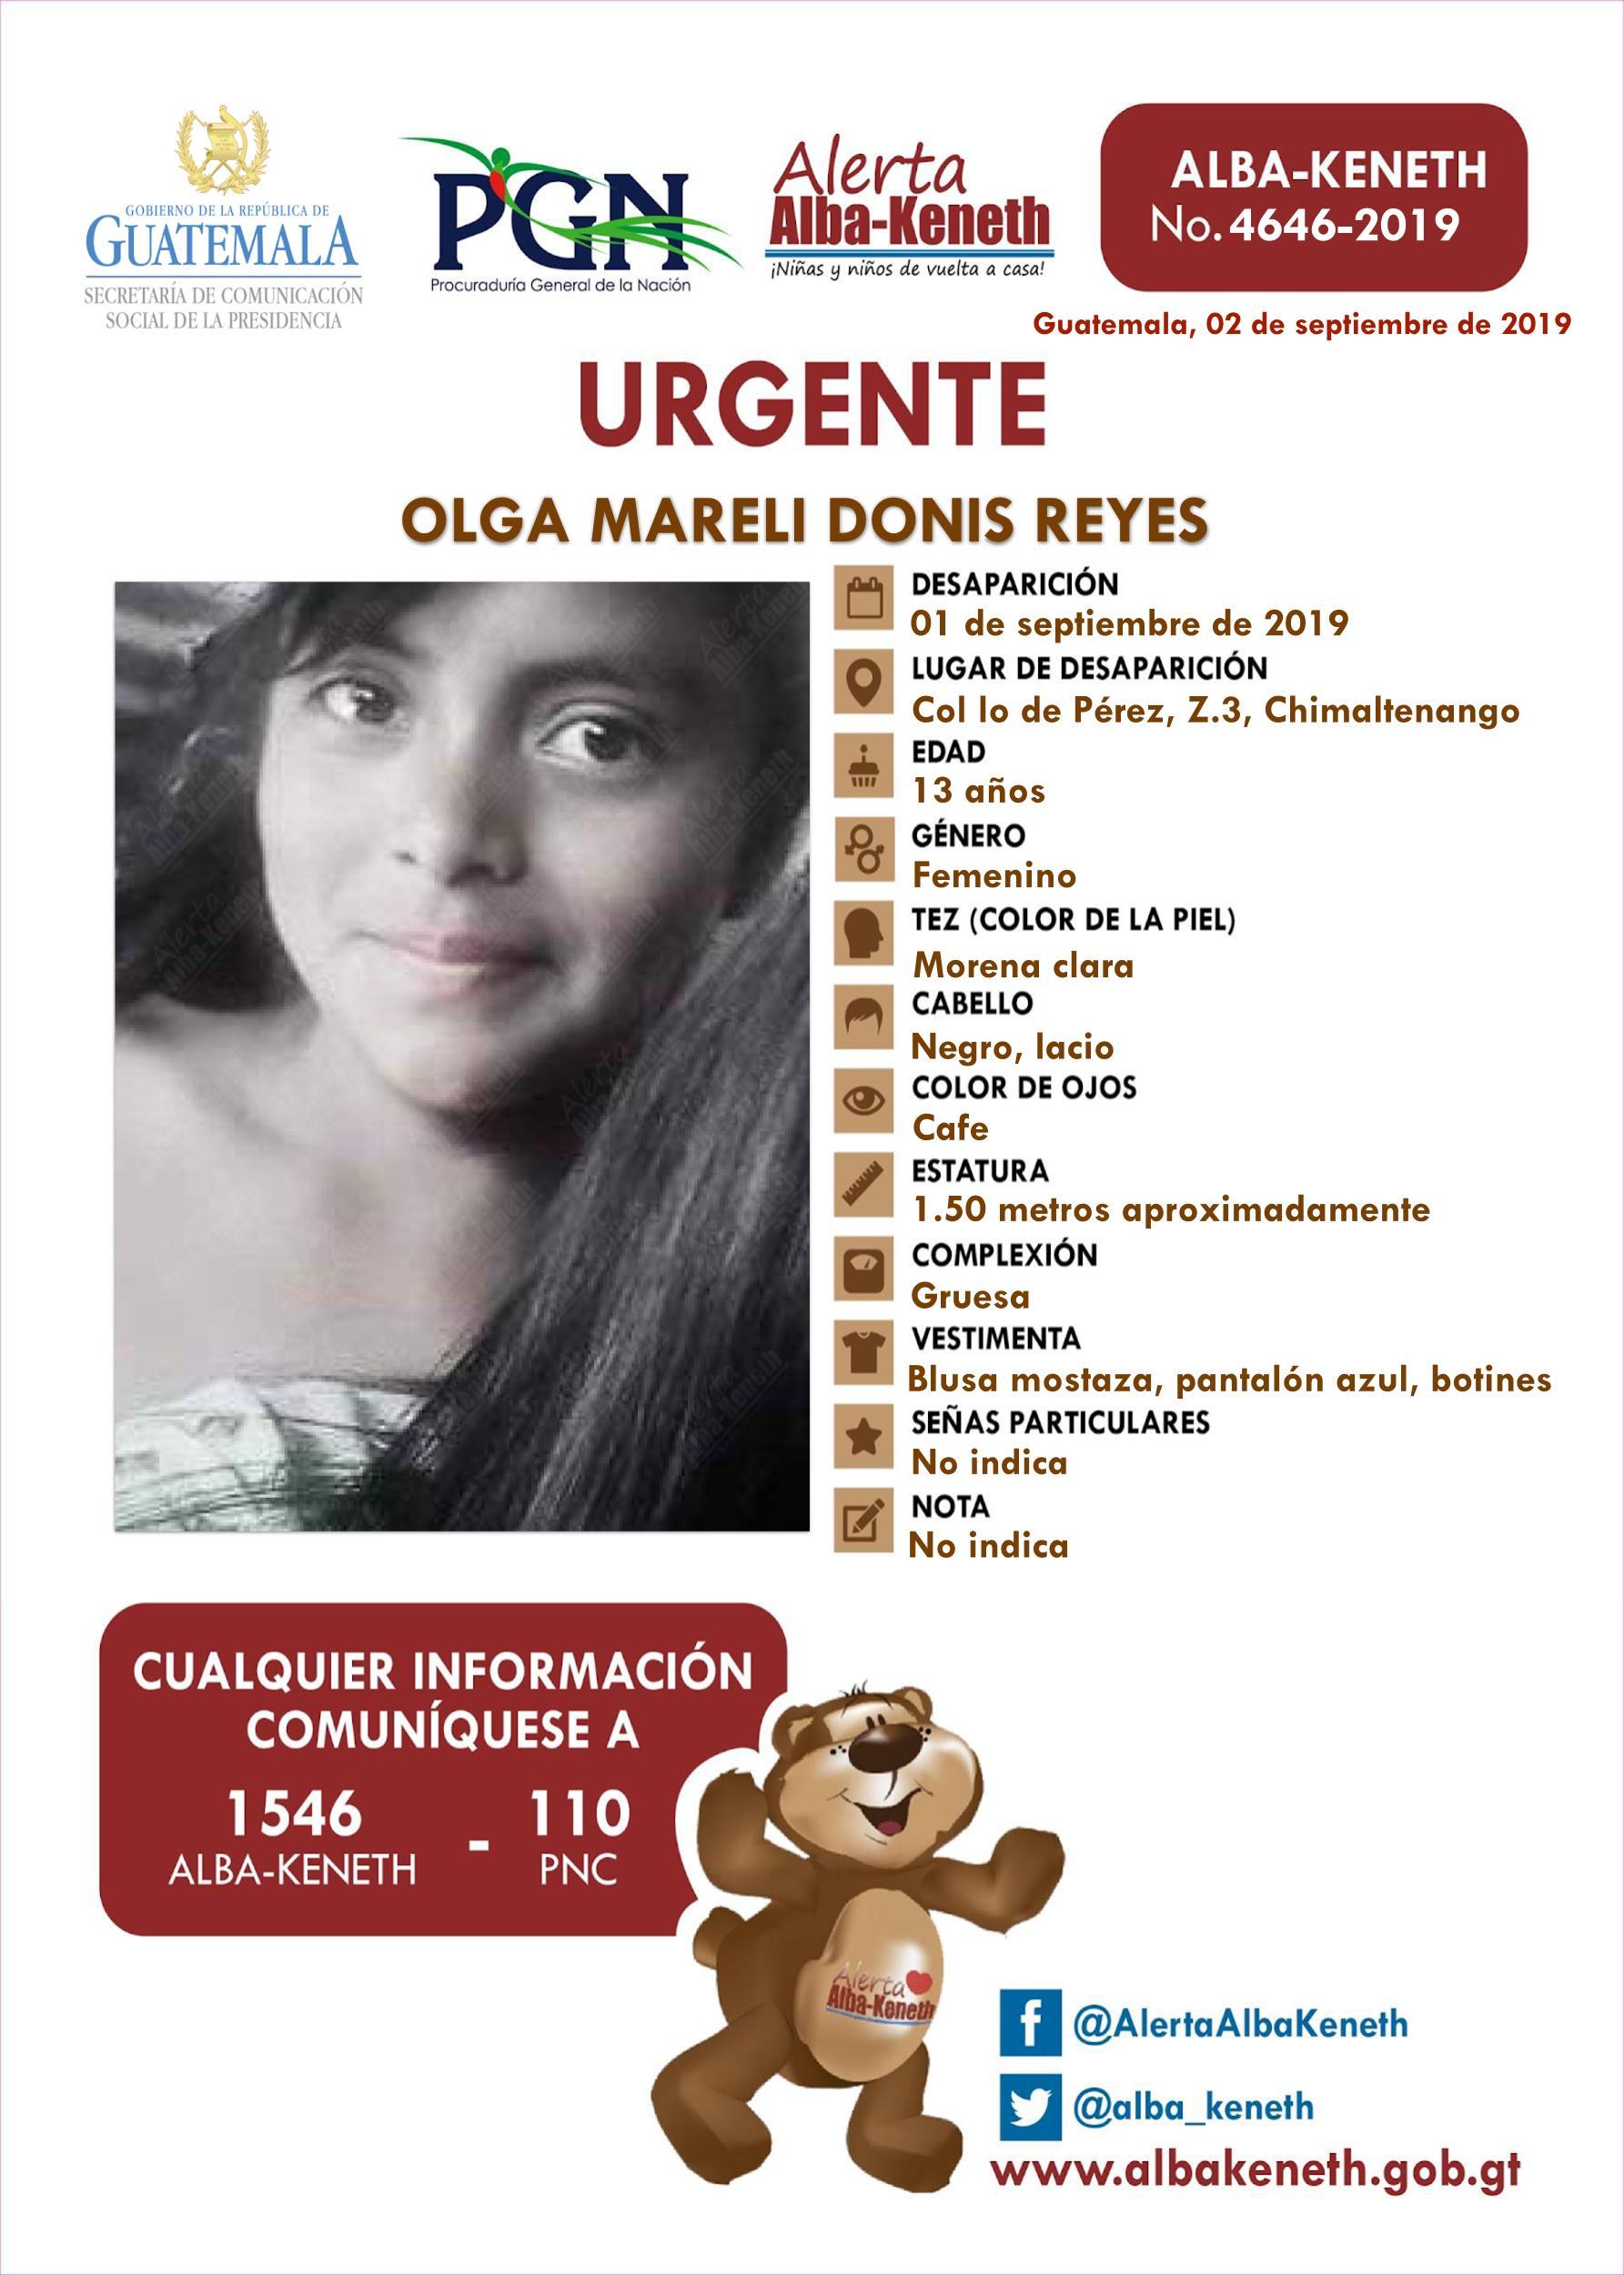 Olga Mareli Donis Reyes